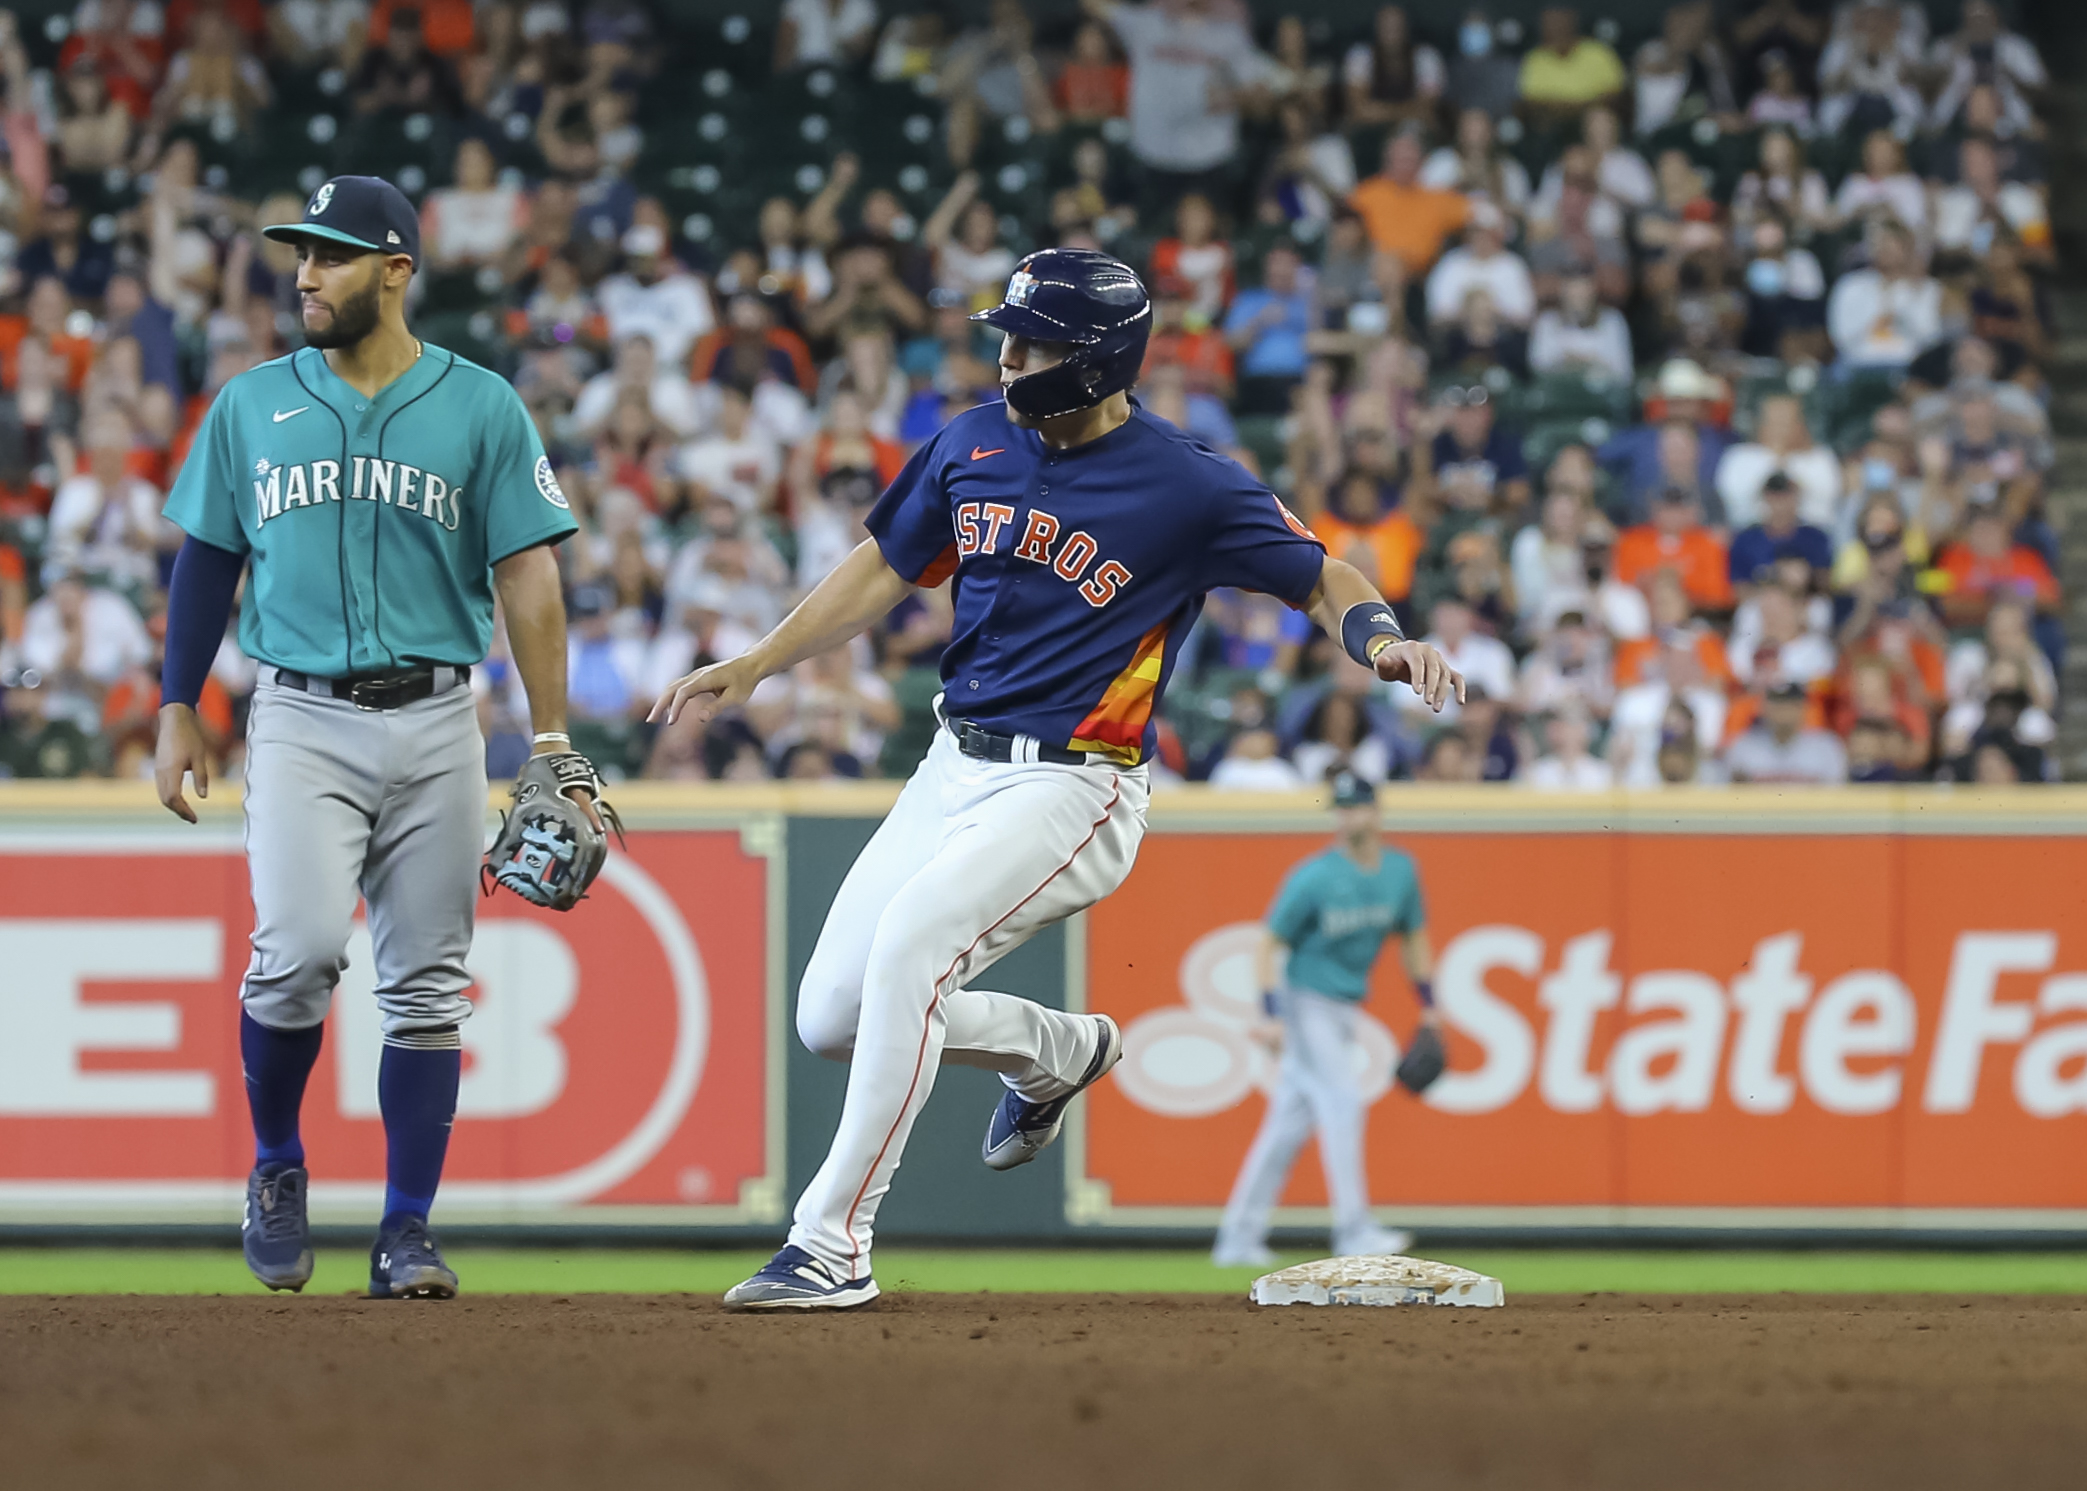 MLB: AUG 22 Mariners at Astros